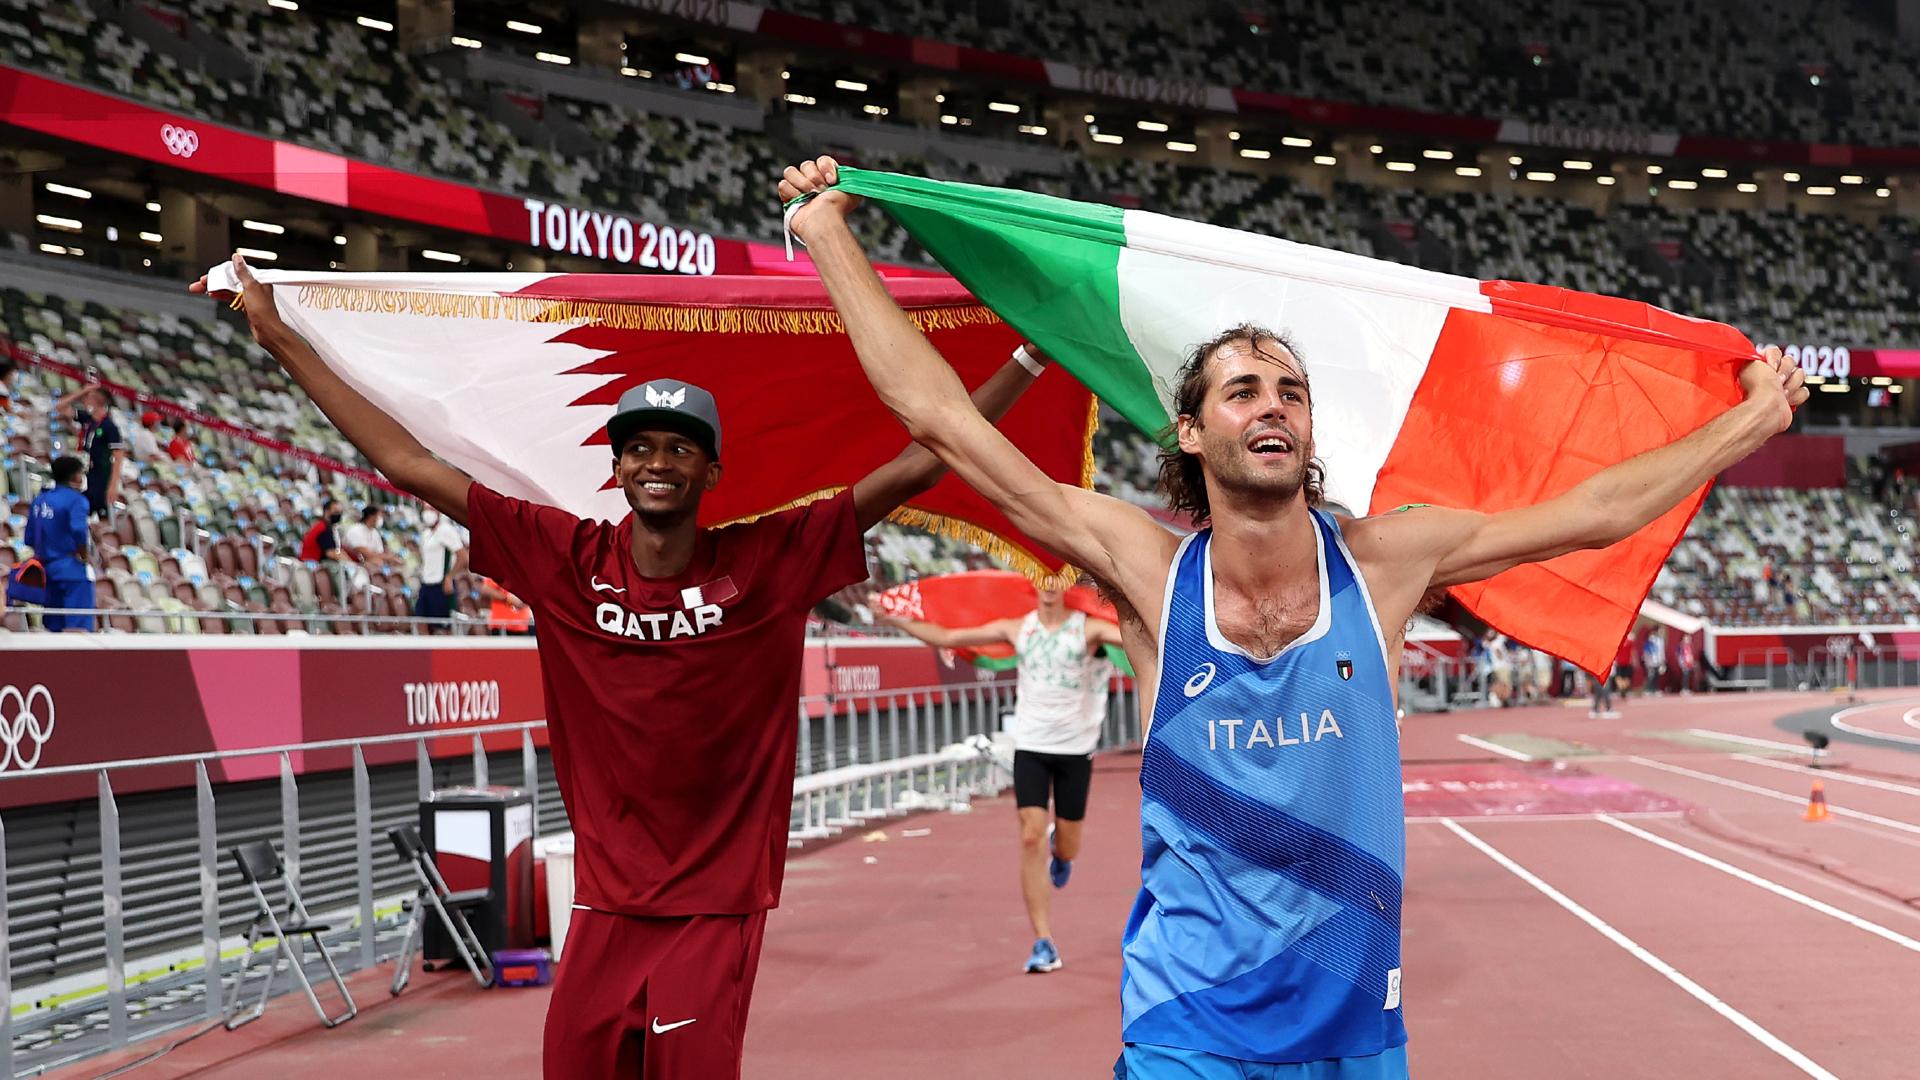 Qatar's Mutaz Esha Barshem, Italy's Gianmarco Tamberi share Olympic gold in men's high jump